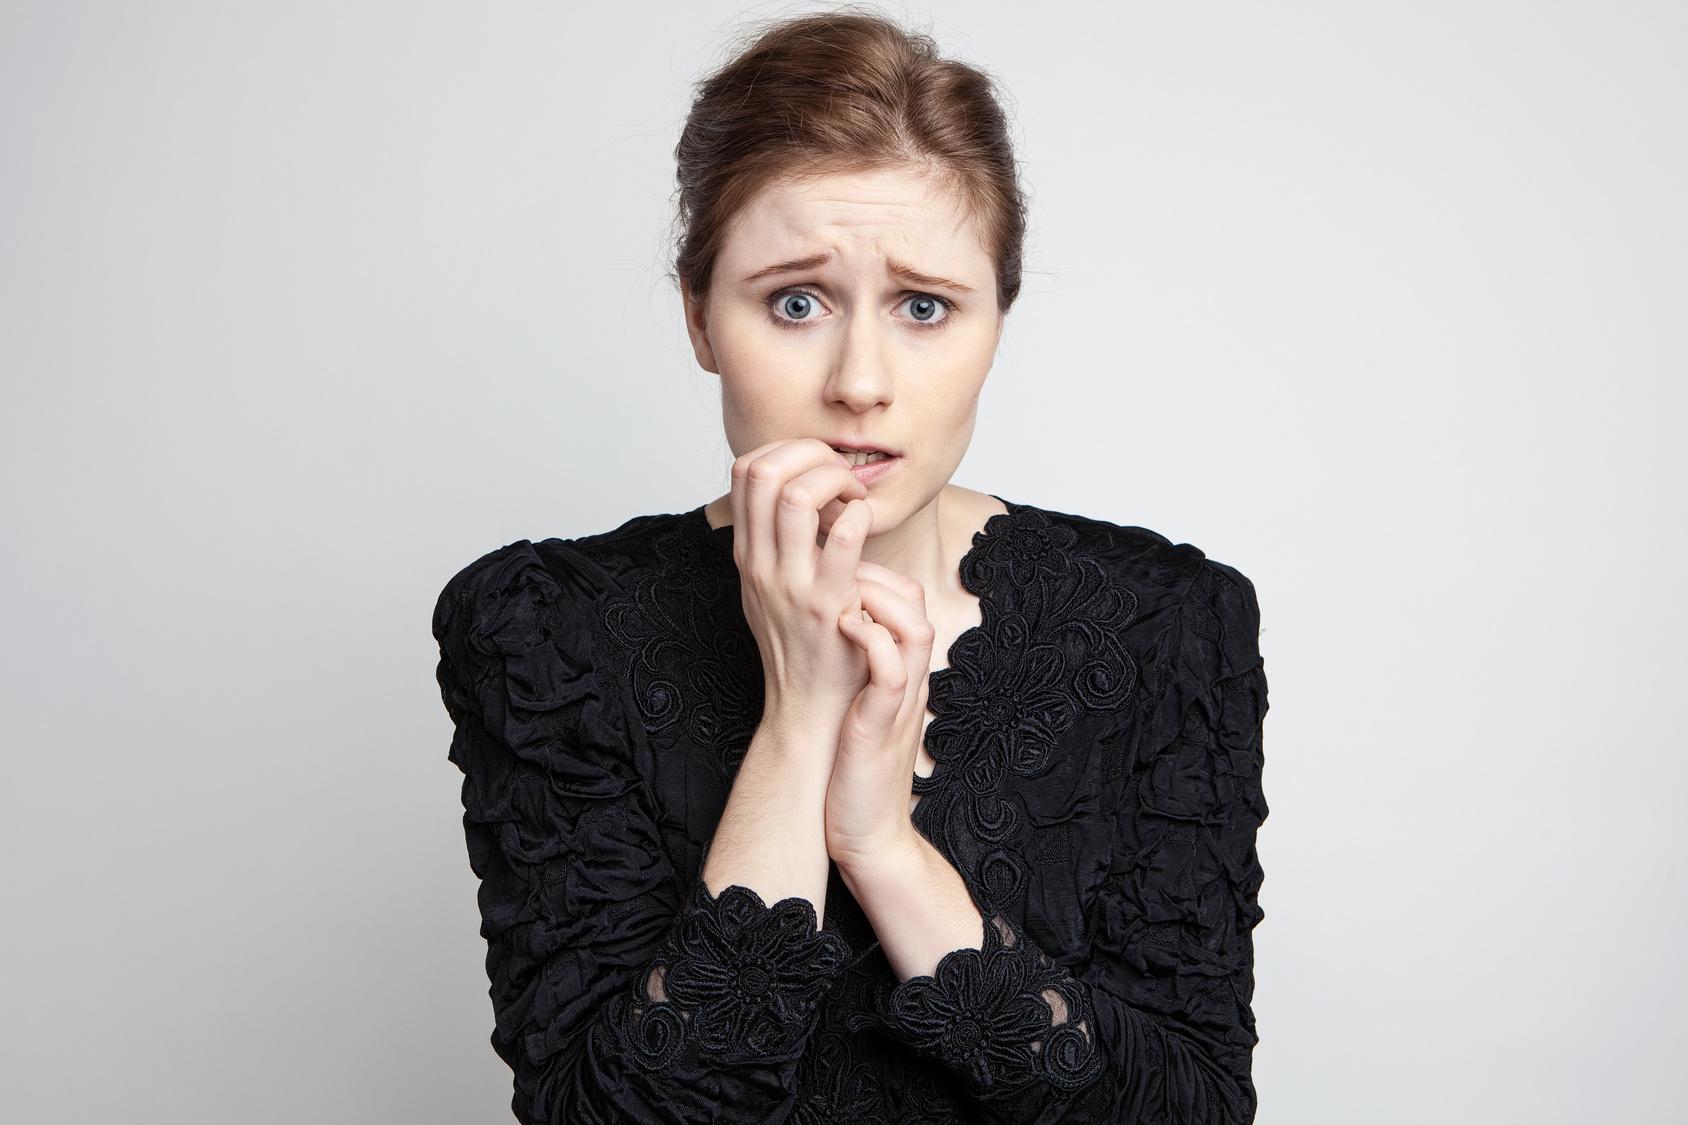 O que realmente significa ter ansiedade?